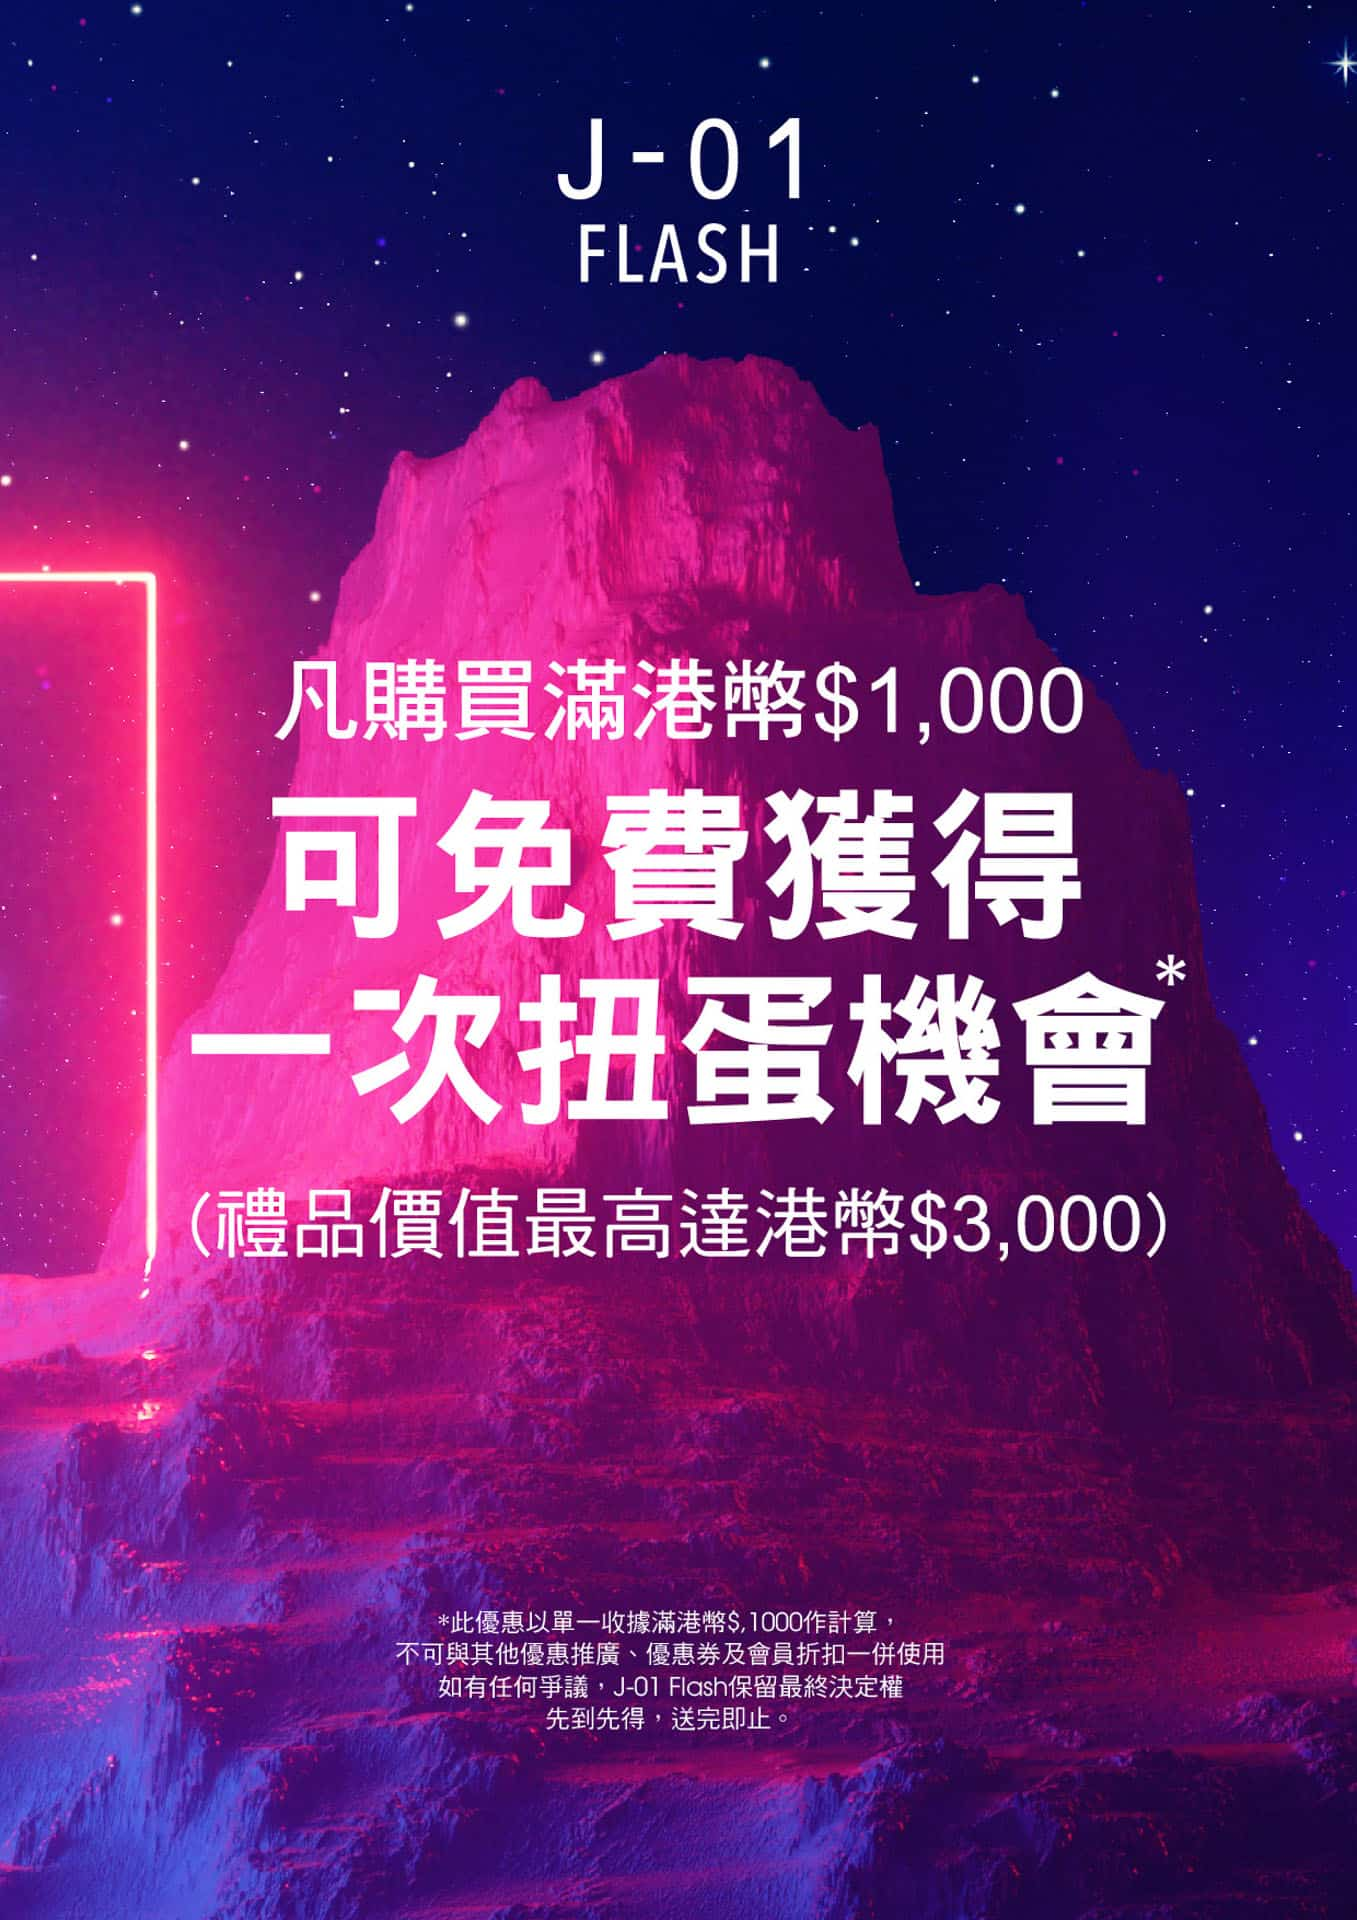 apm:J-01 FLASH期間限定店 單一收據每滿HK$1000將會有一次扭蛋機會。